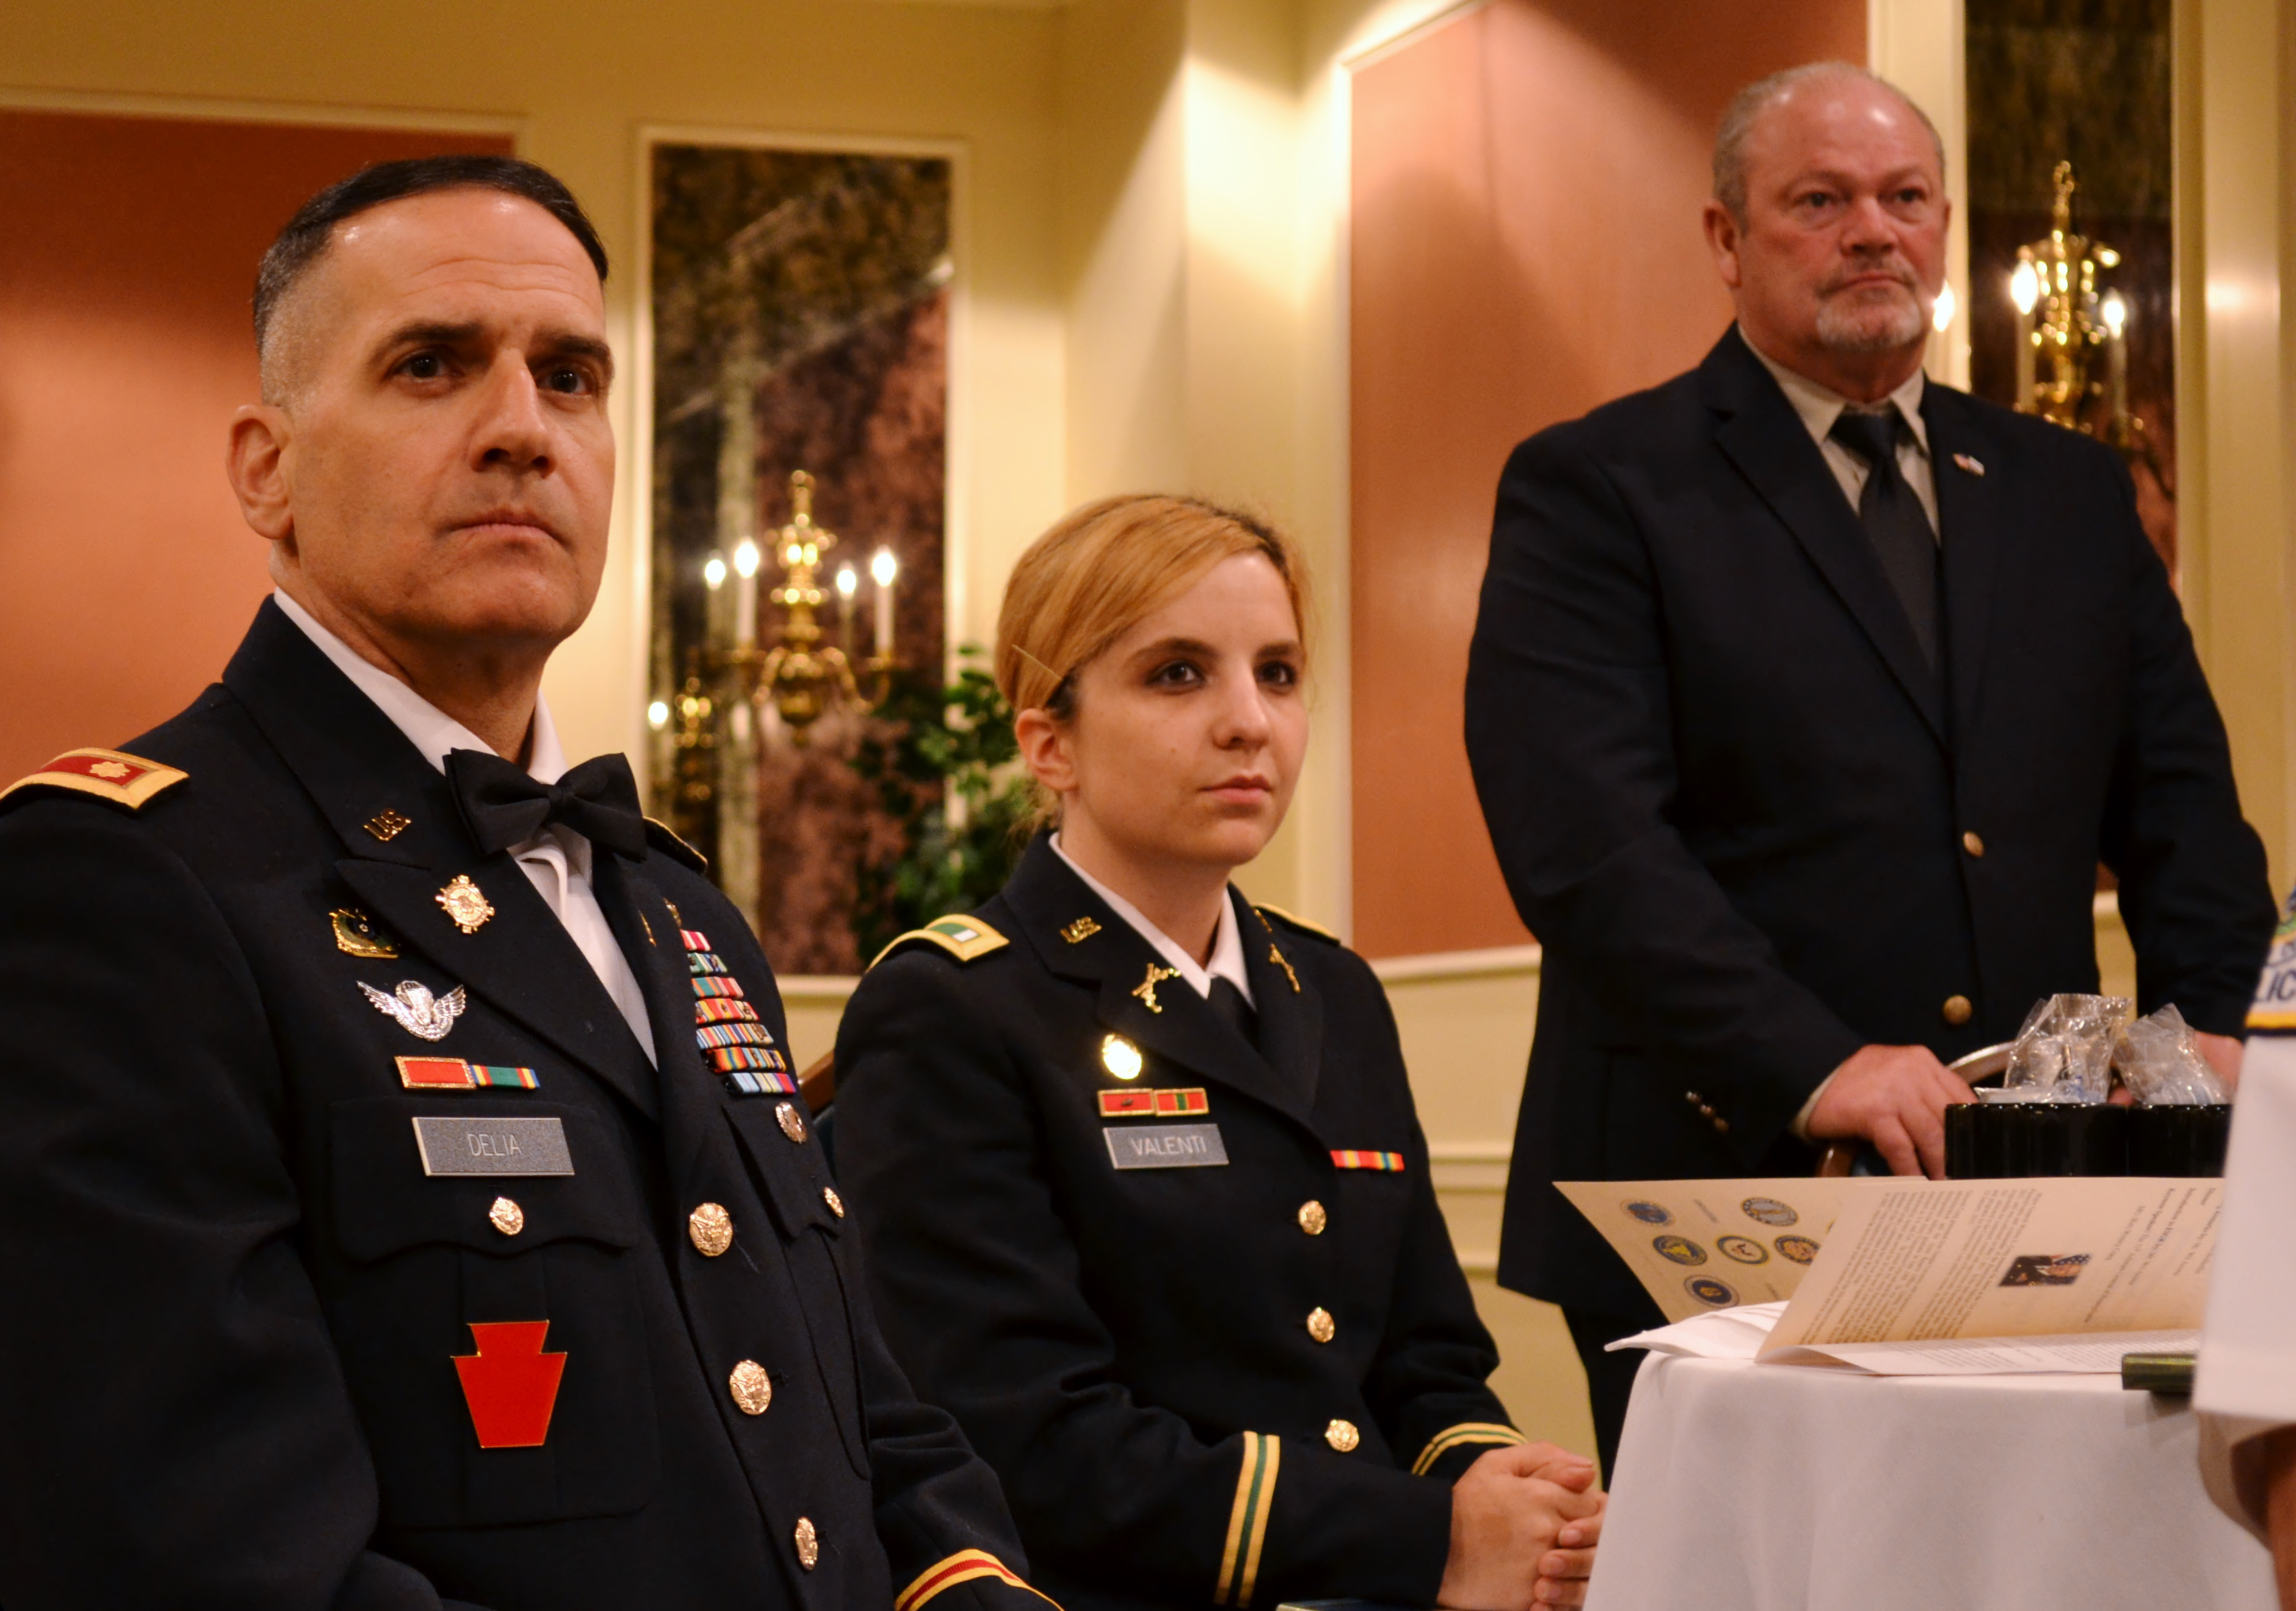 Pa. ESGR awards ceremony shines light on superior citizens > Air ...